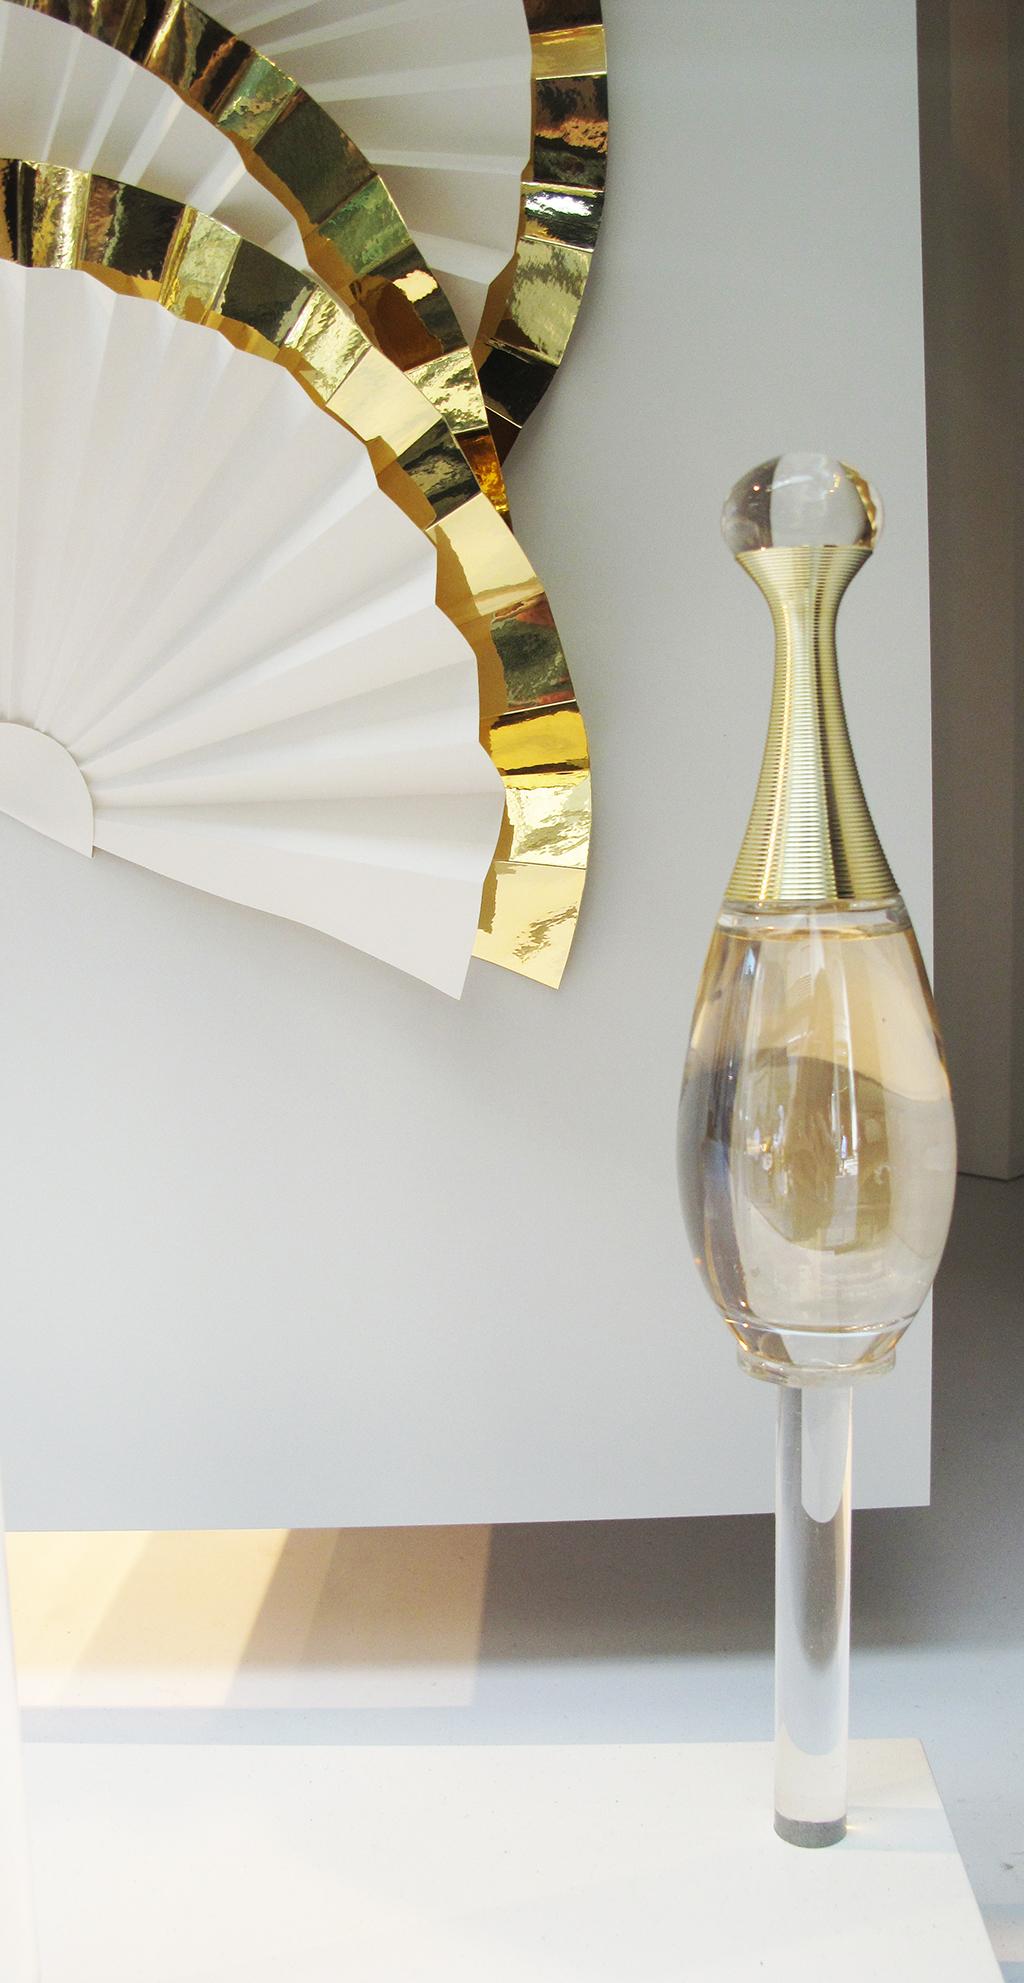 dior j 39 adore 39 voile de parfum 39 window display at au printemps best window displays. Black Bedroom Furniture Sets. Home Design Ideas